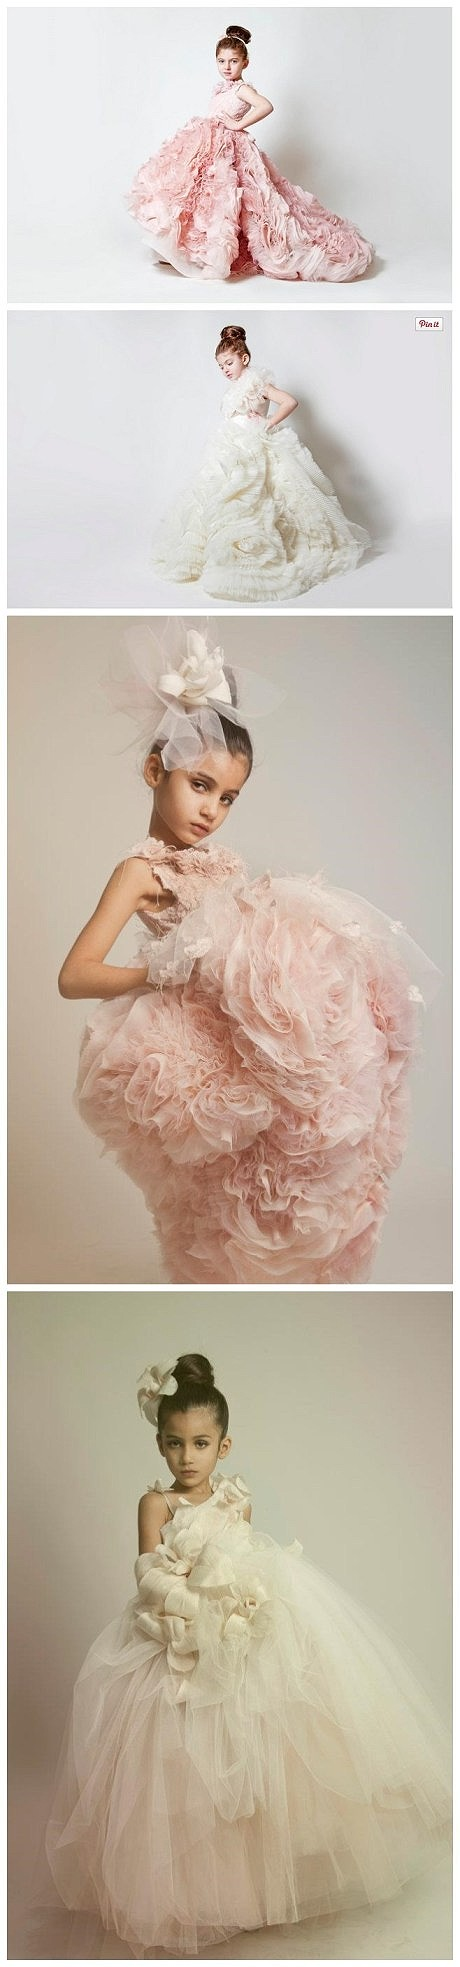 Little flower girl dress costume wedding ~ Meng-dimensional flowers die you will not!